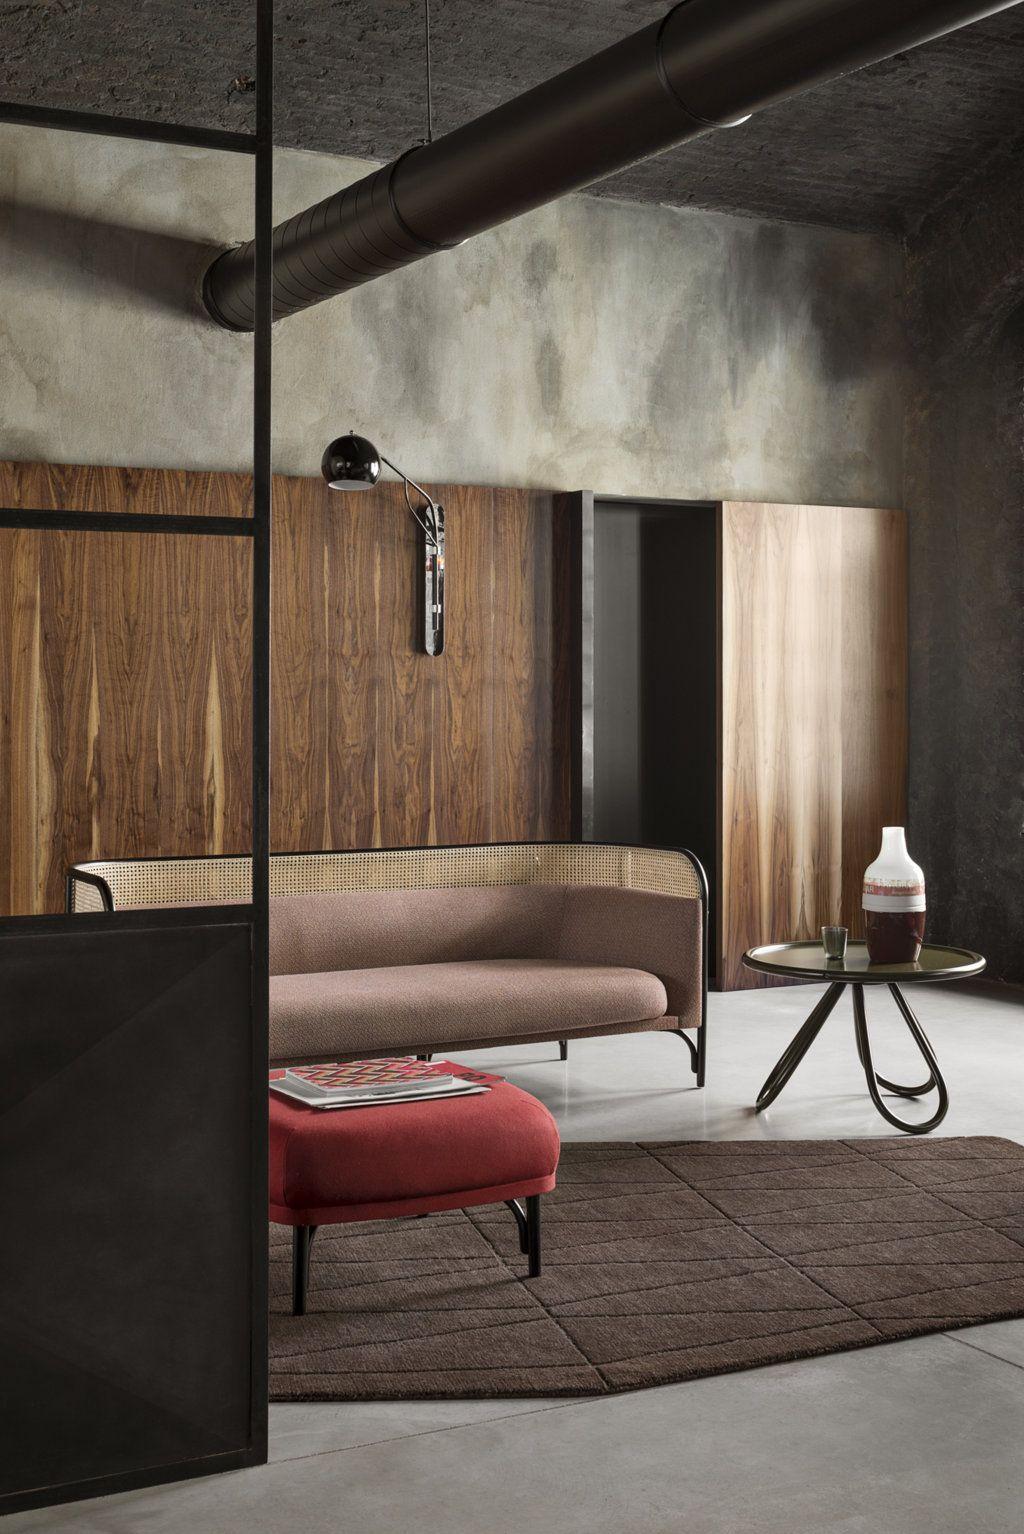 Rundes Sofa Modernes Sofa Runde Sofas | RUNDE SACHE | Pinterest | Rundes  Sofa, Modernes Sofa Und Sofa